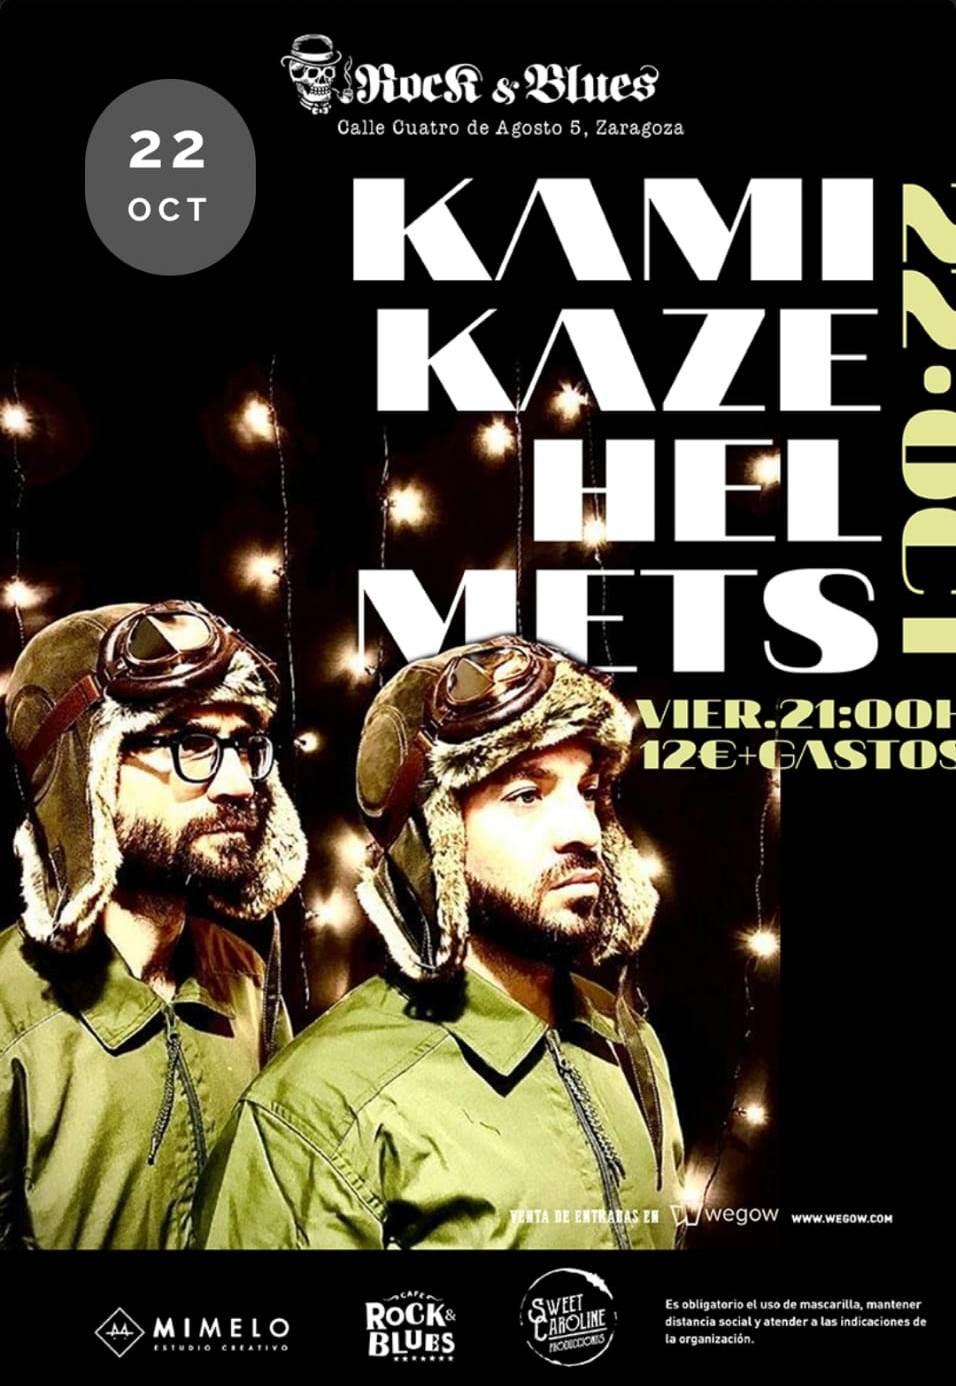 Kamikaze Helmets oncierto-Rock-And-Blues-Zaragoza-.-Aragon-En-Vivo